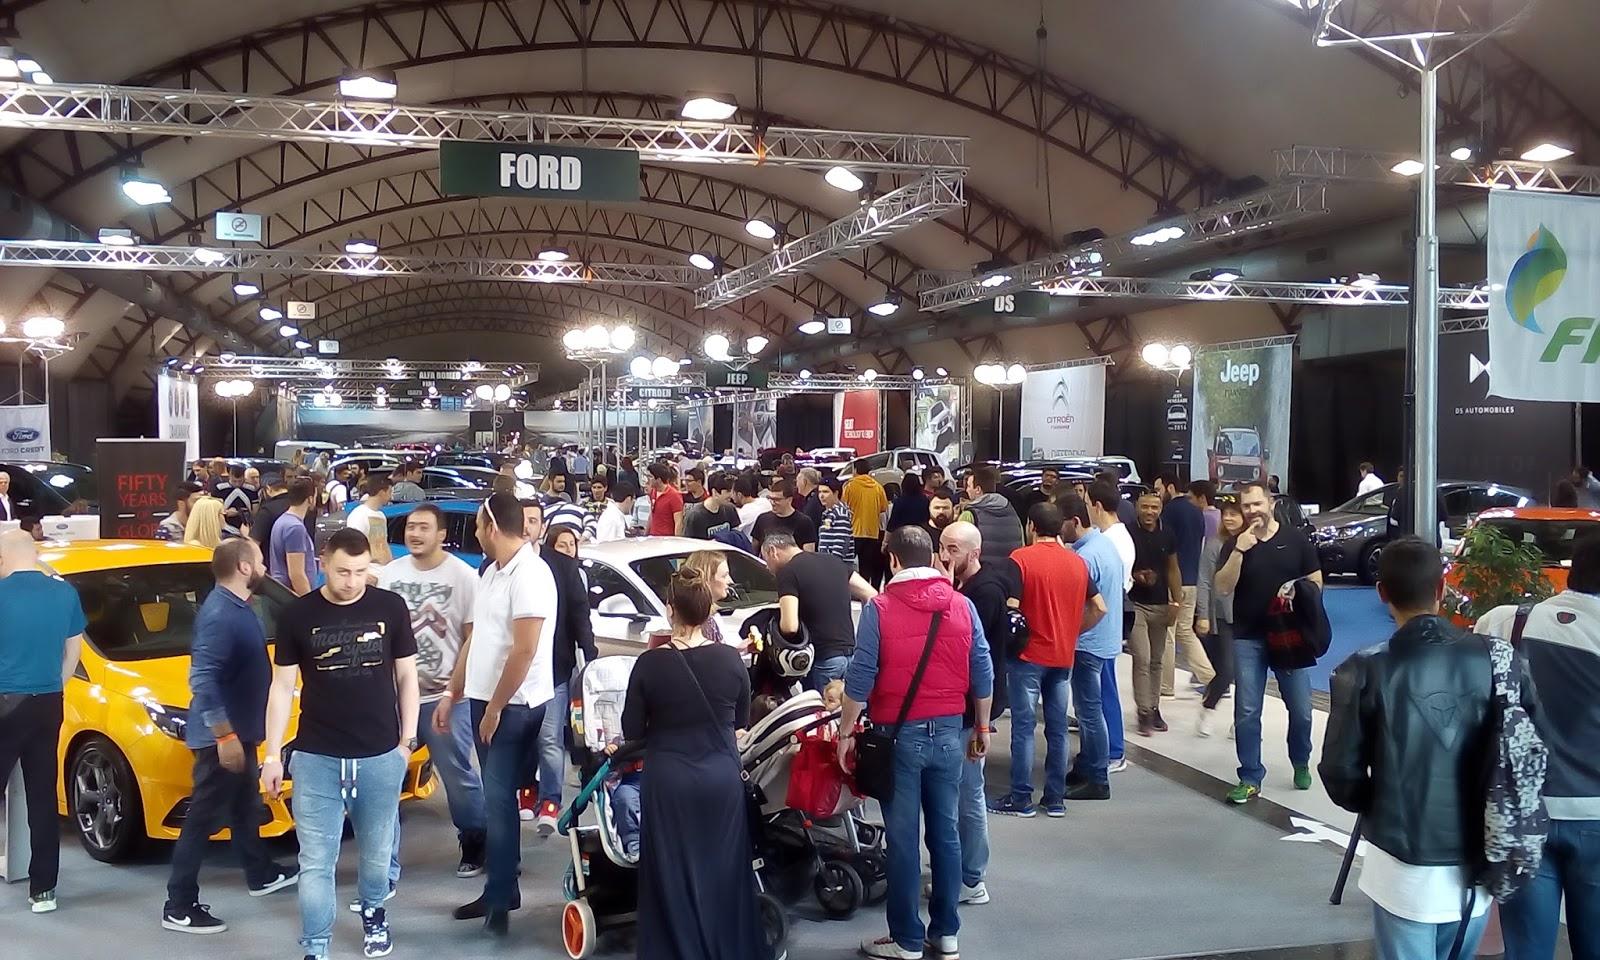 IMG 20160416 191259 Με μεγάλη επιτυχία ολοκληρώθηκε το πρώτο AUTO FESTIVAL ΘΕΣΣΑΛΟΝΙΚΗΣ Auto Festival, AUTO FESTIVAL ΘΕΣΣΑΛΟΝΙΚΗΣ, autoshow